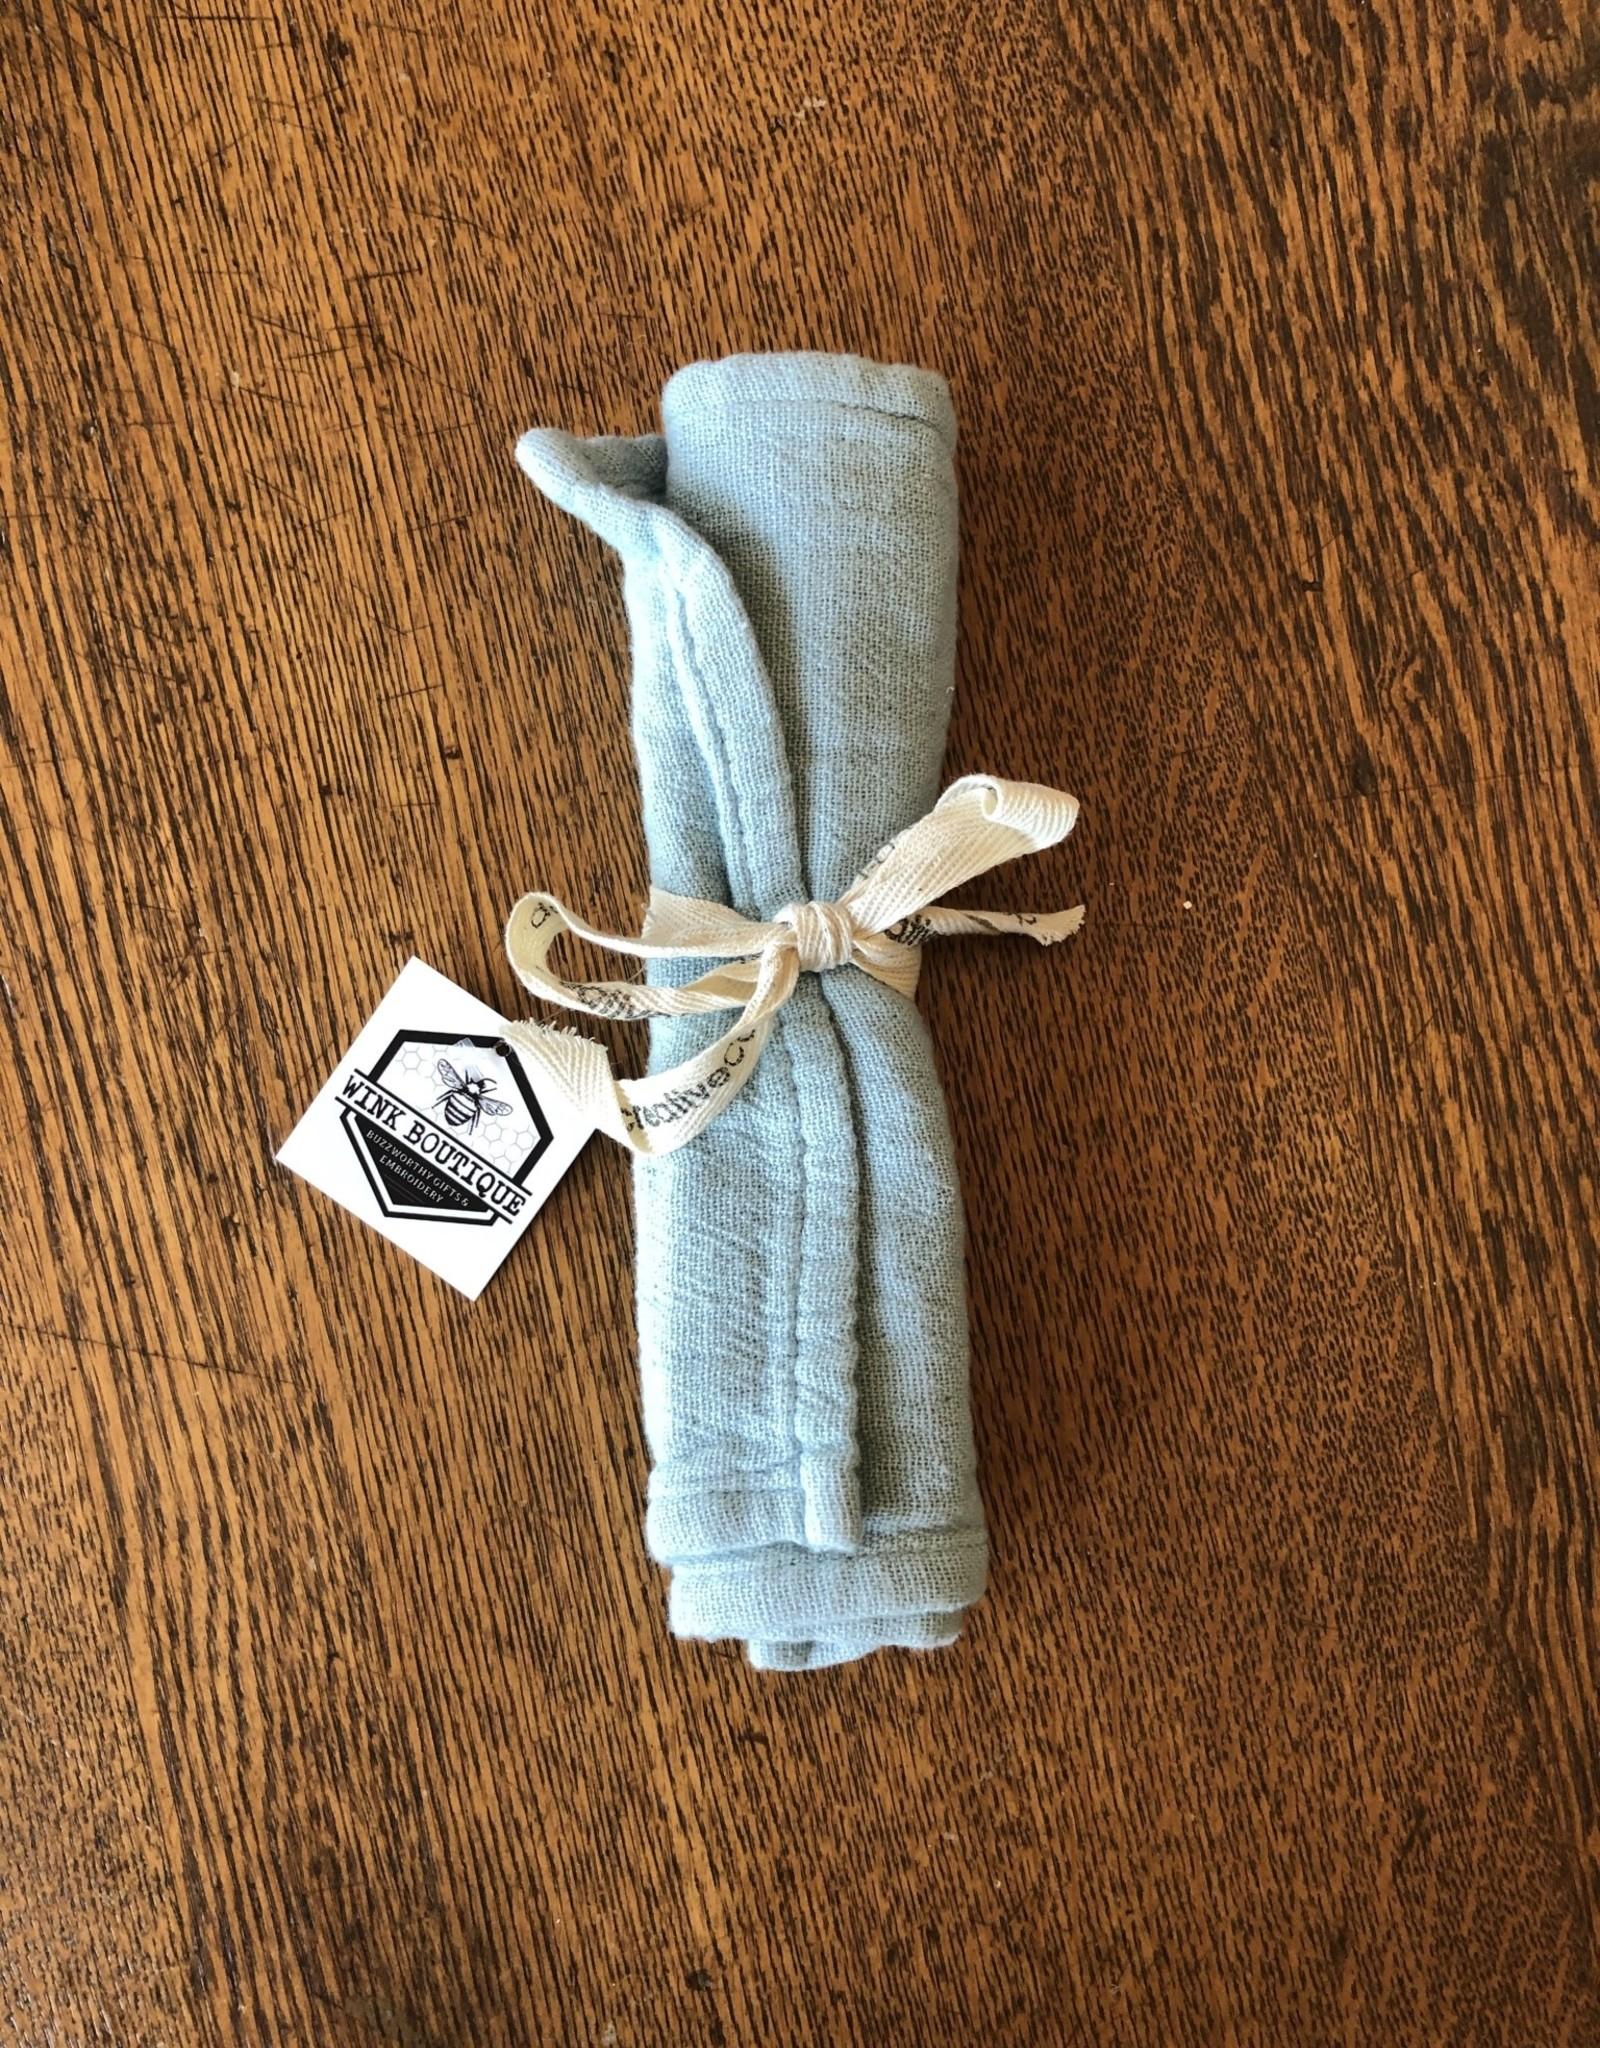 Wink Cotton Burp Cloth